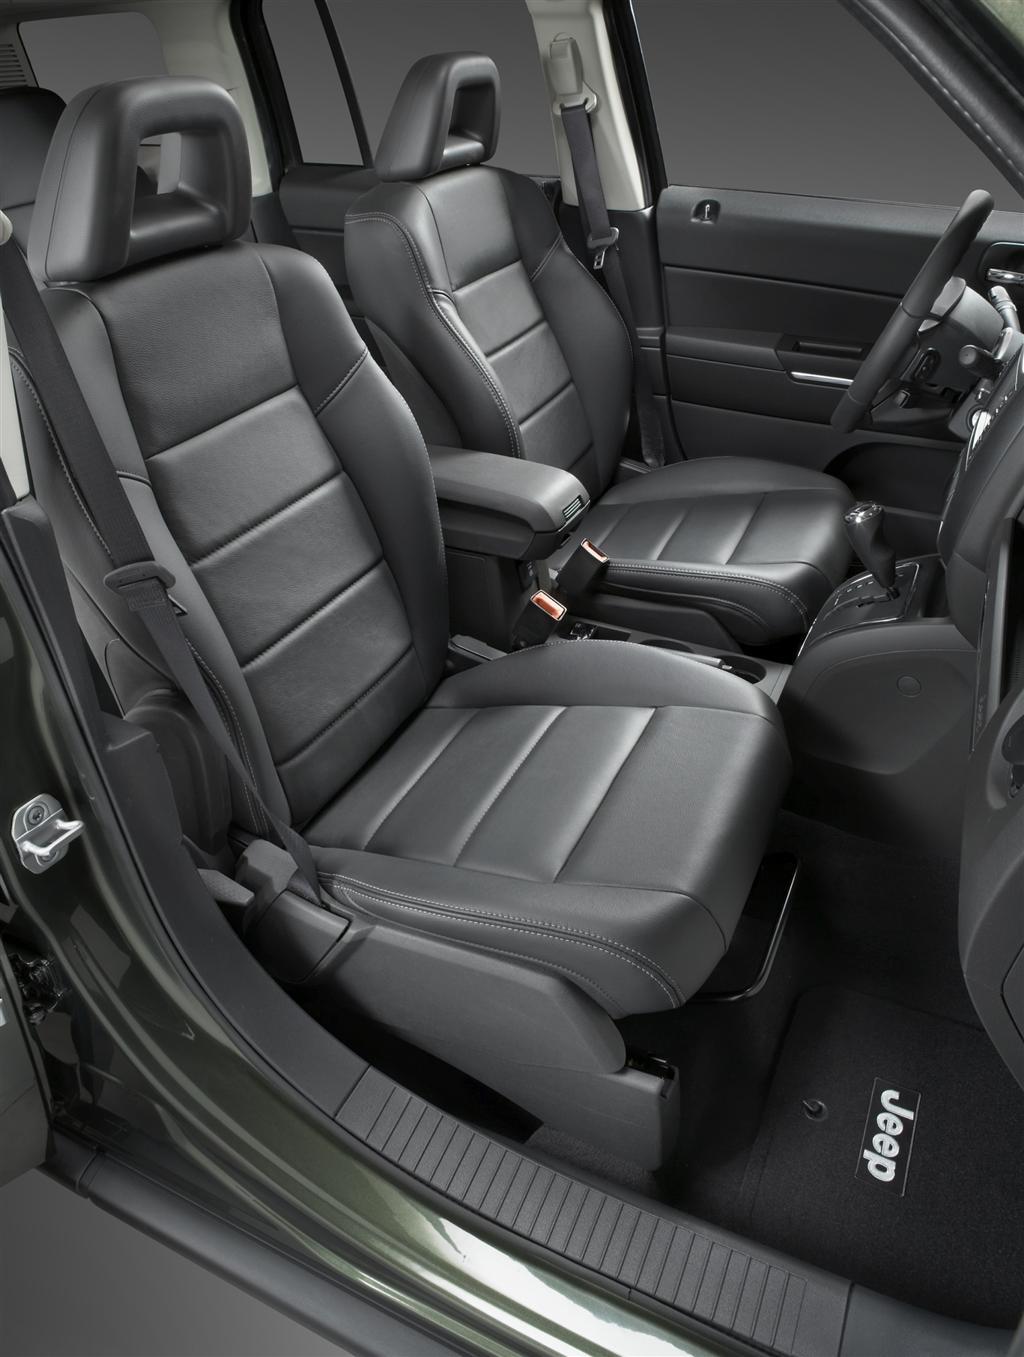 2009 Jeep Patriot - conceptcarz.com